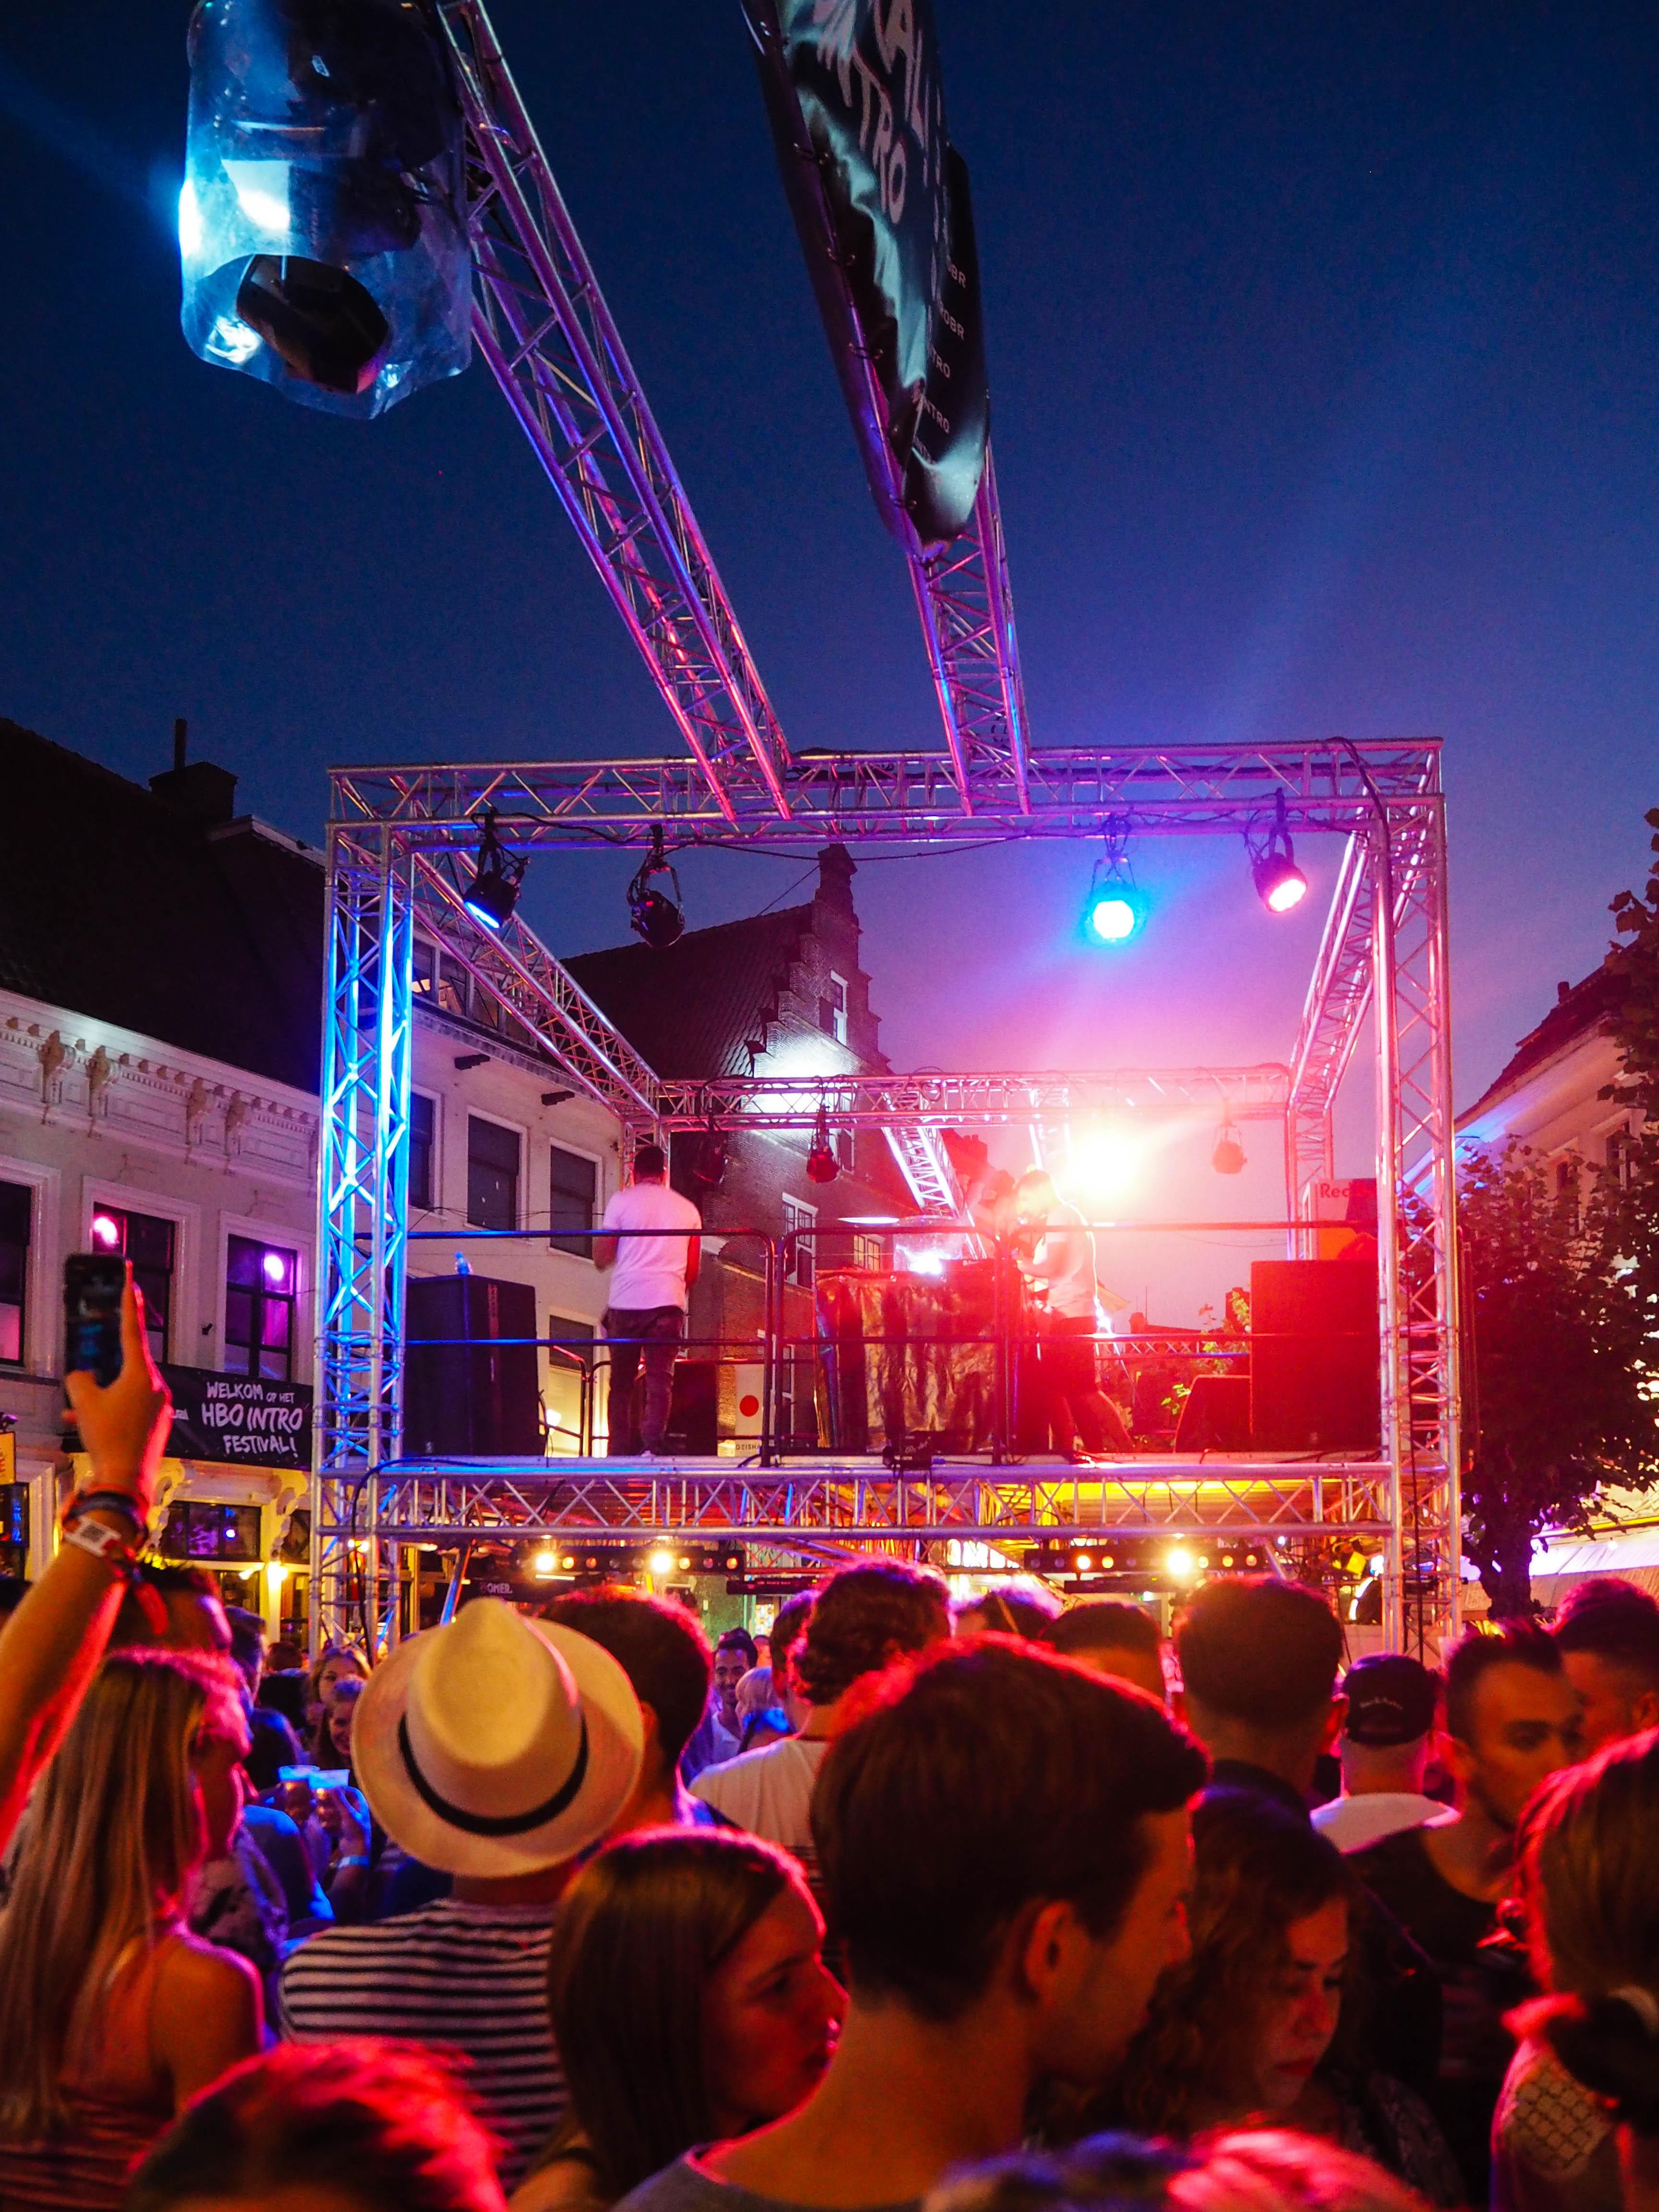 hbointrofestivalbreda2016-44-of-63